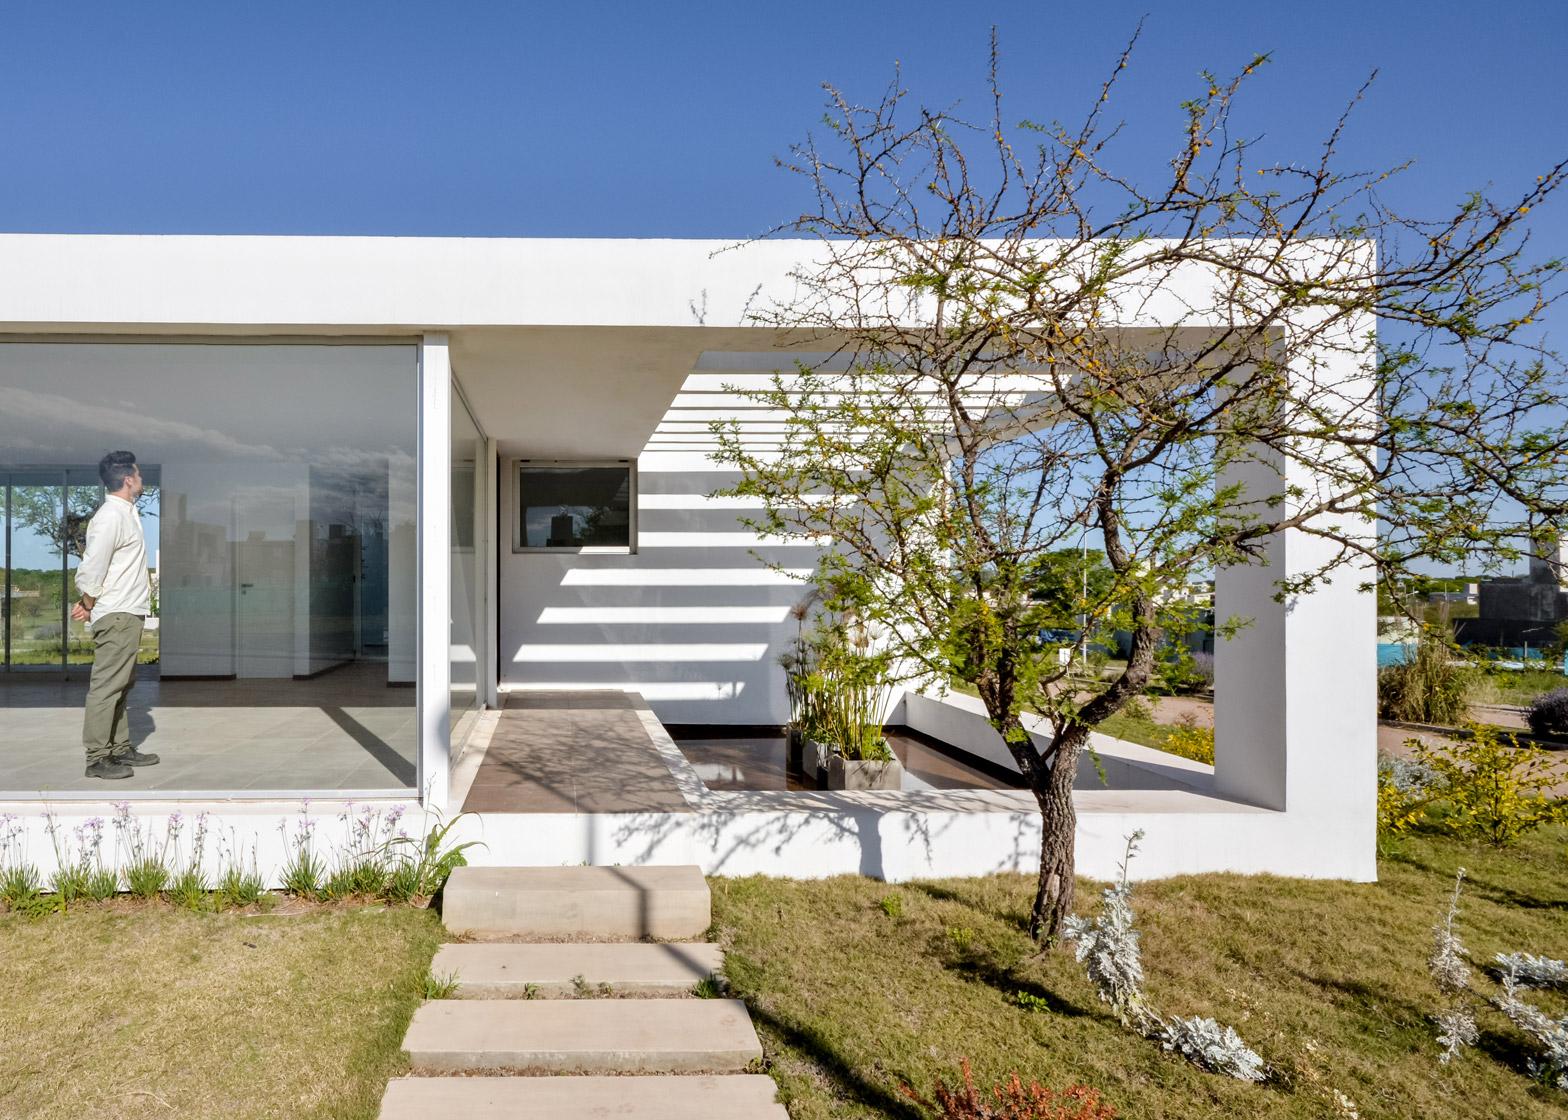 Casa Belavista by Agustín Lozada